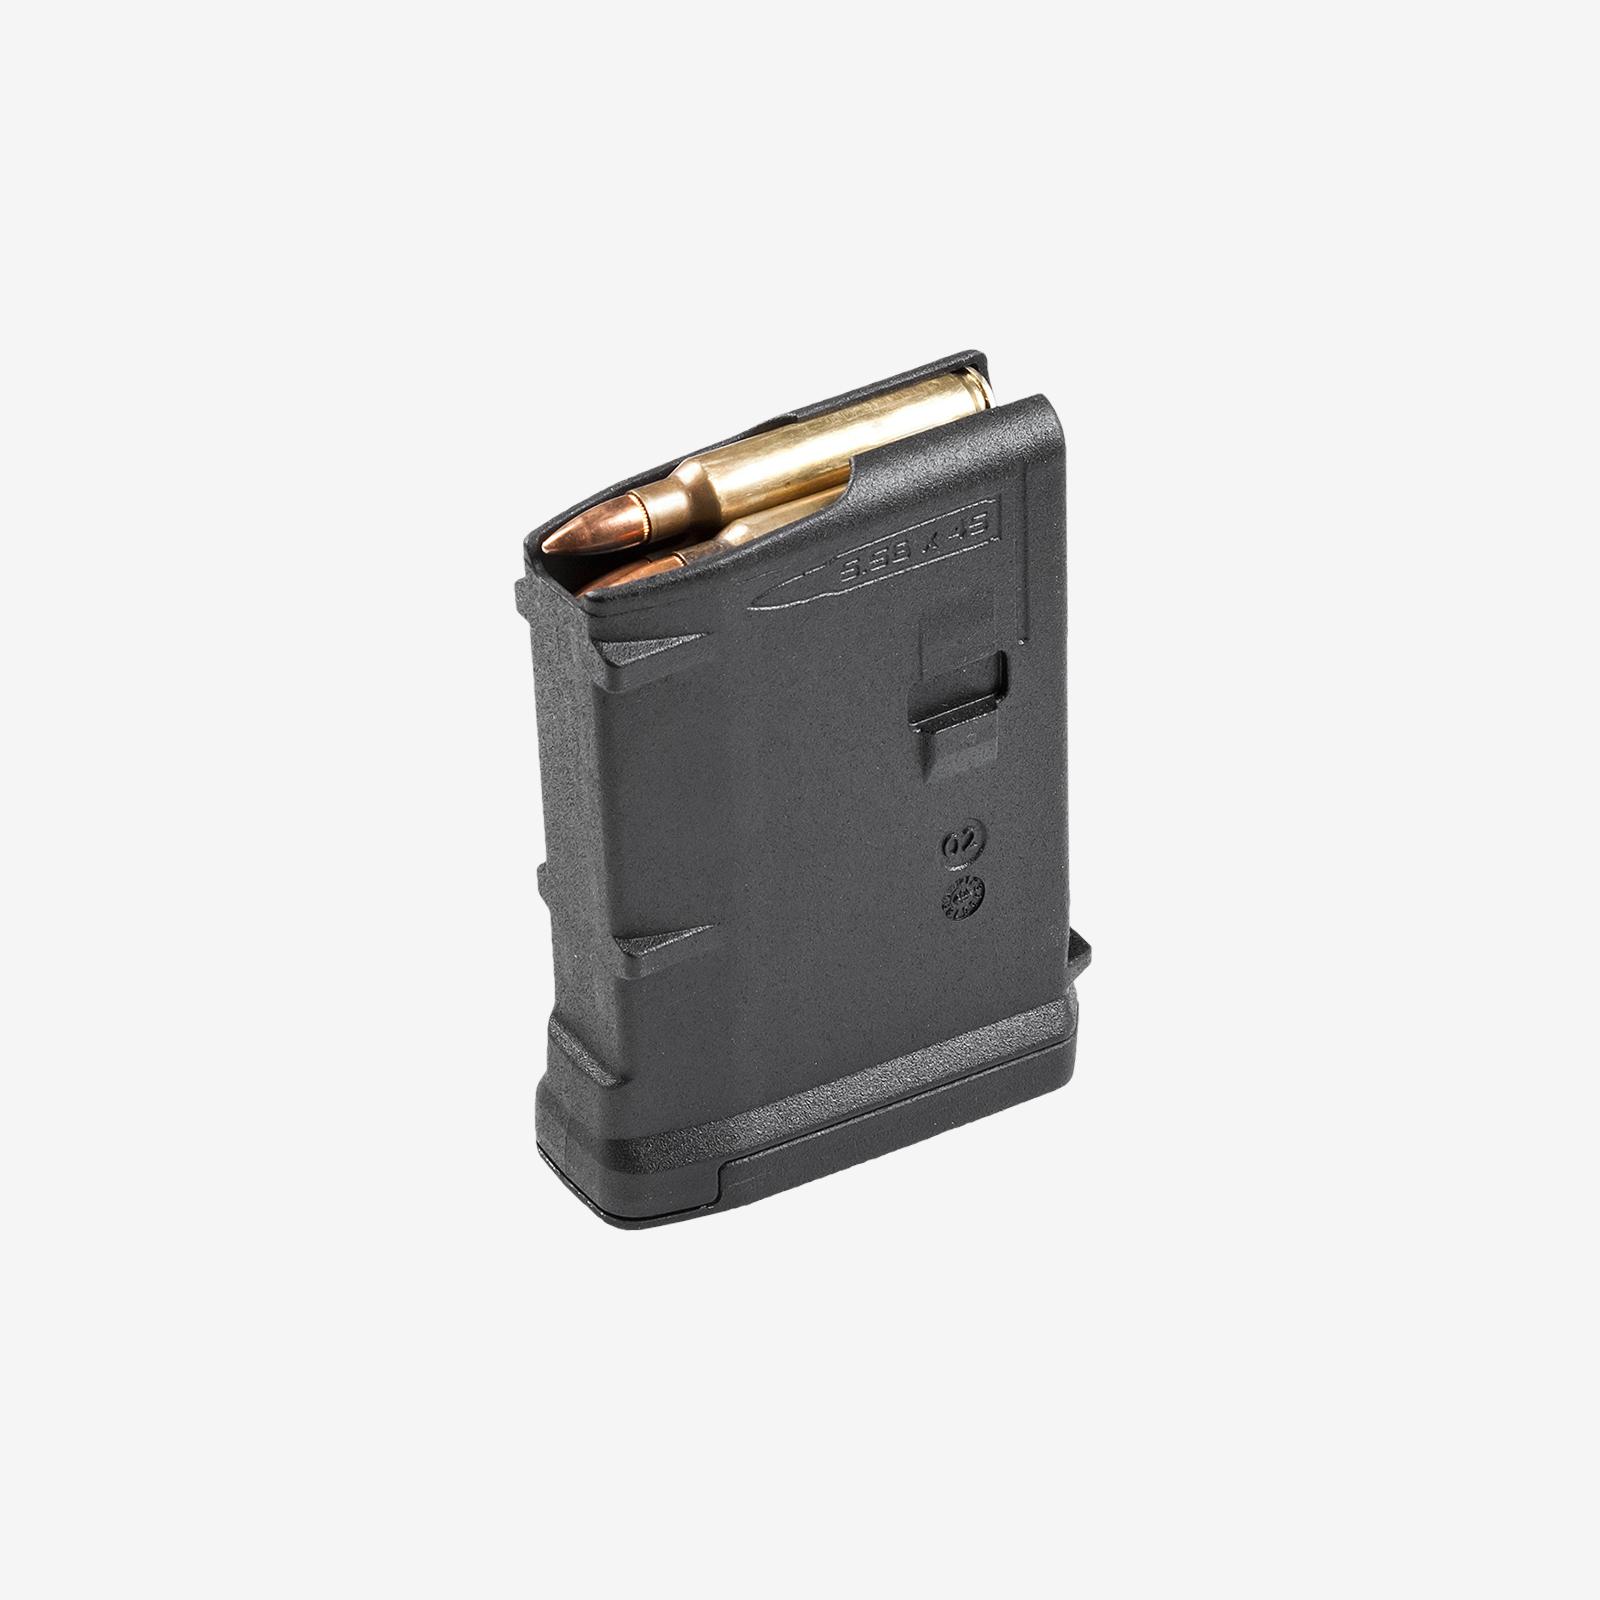 Magpul PMAG Gen M3 AR-15 Magazine .223/5.56 10 Rounds Polymer Black MAG559-BLK